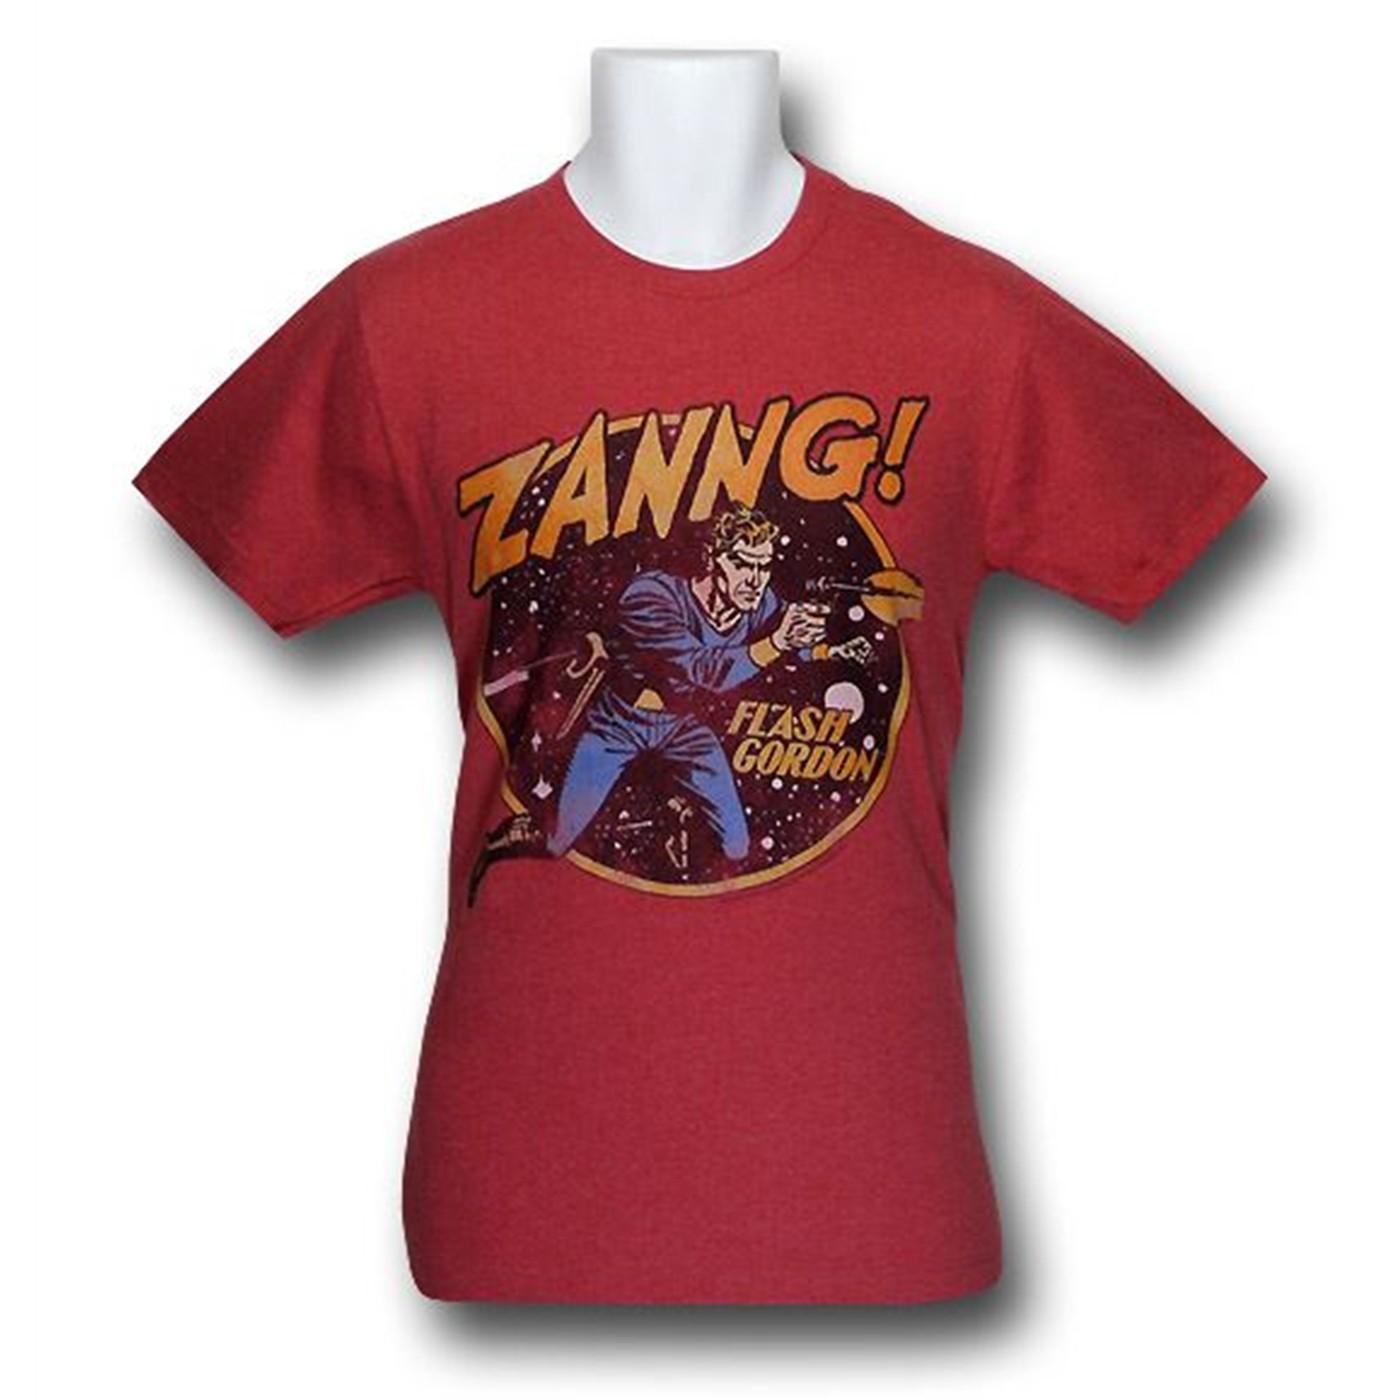 Flash Gordon ZANNG! Distressed 30 Single T-Shirt